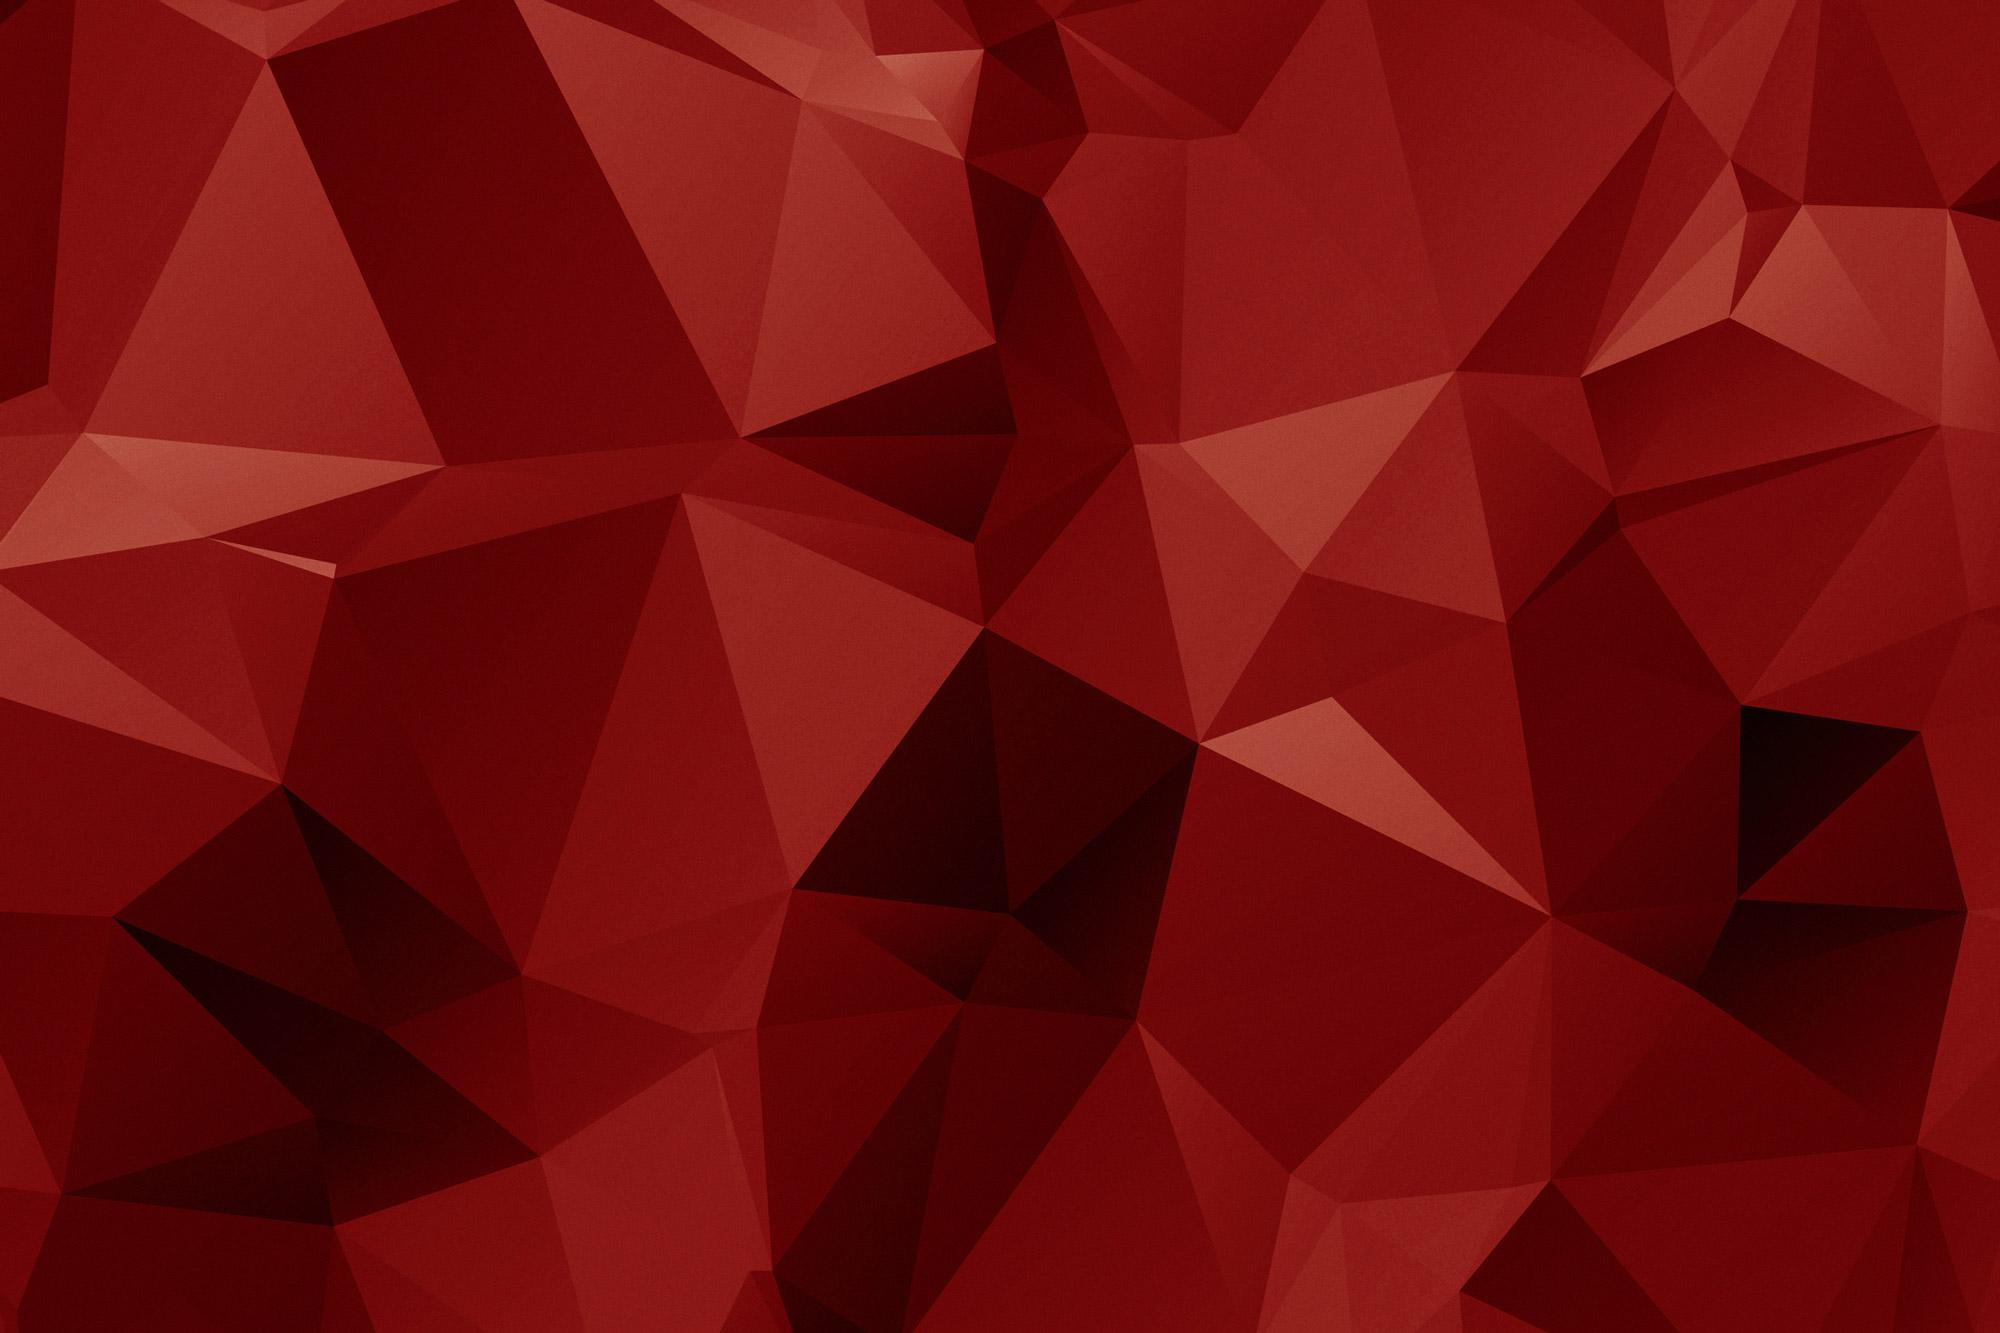 Farbenwirkung rot